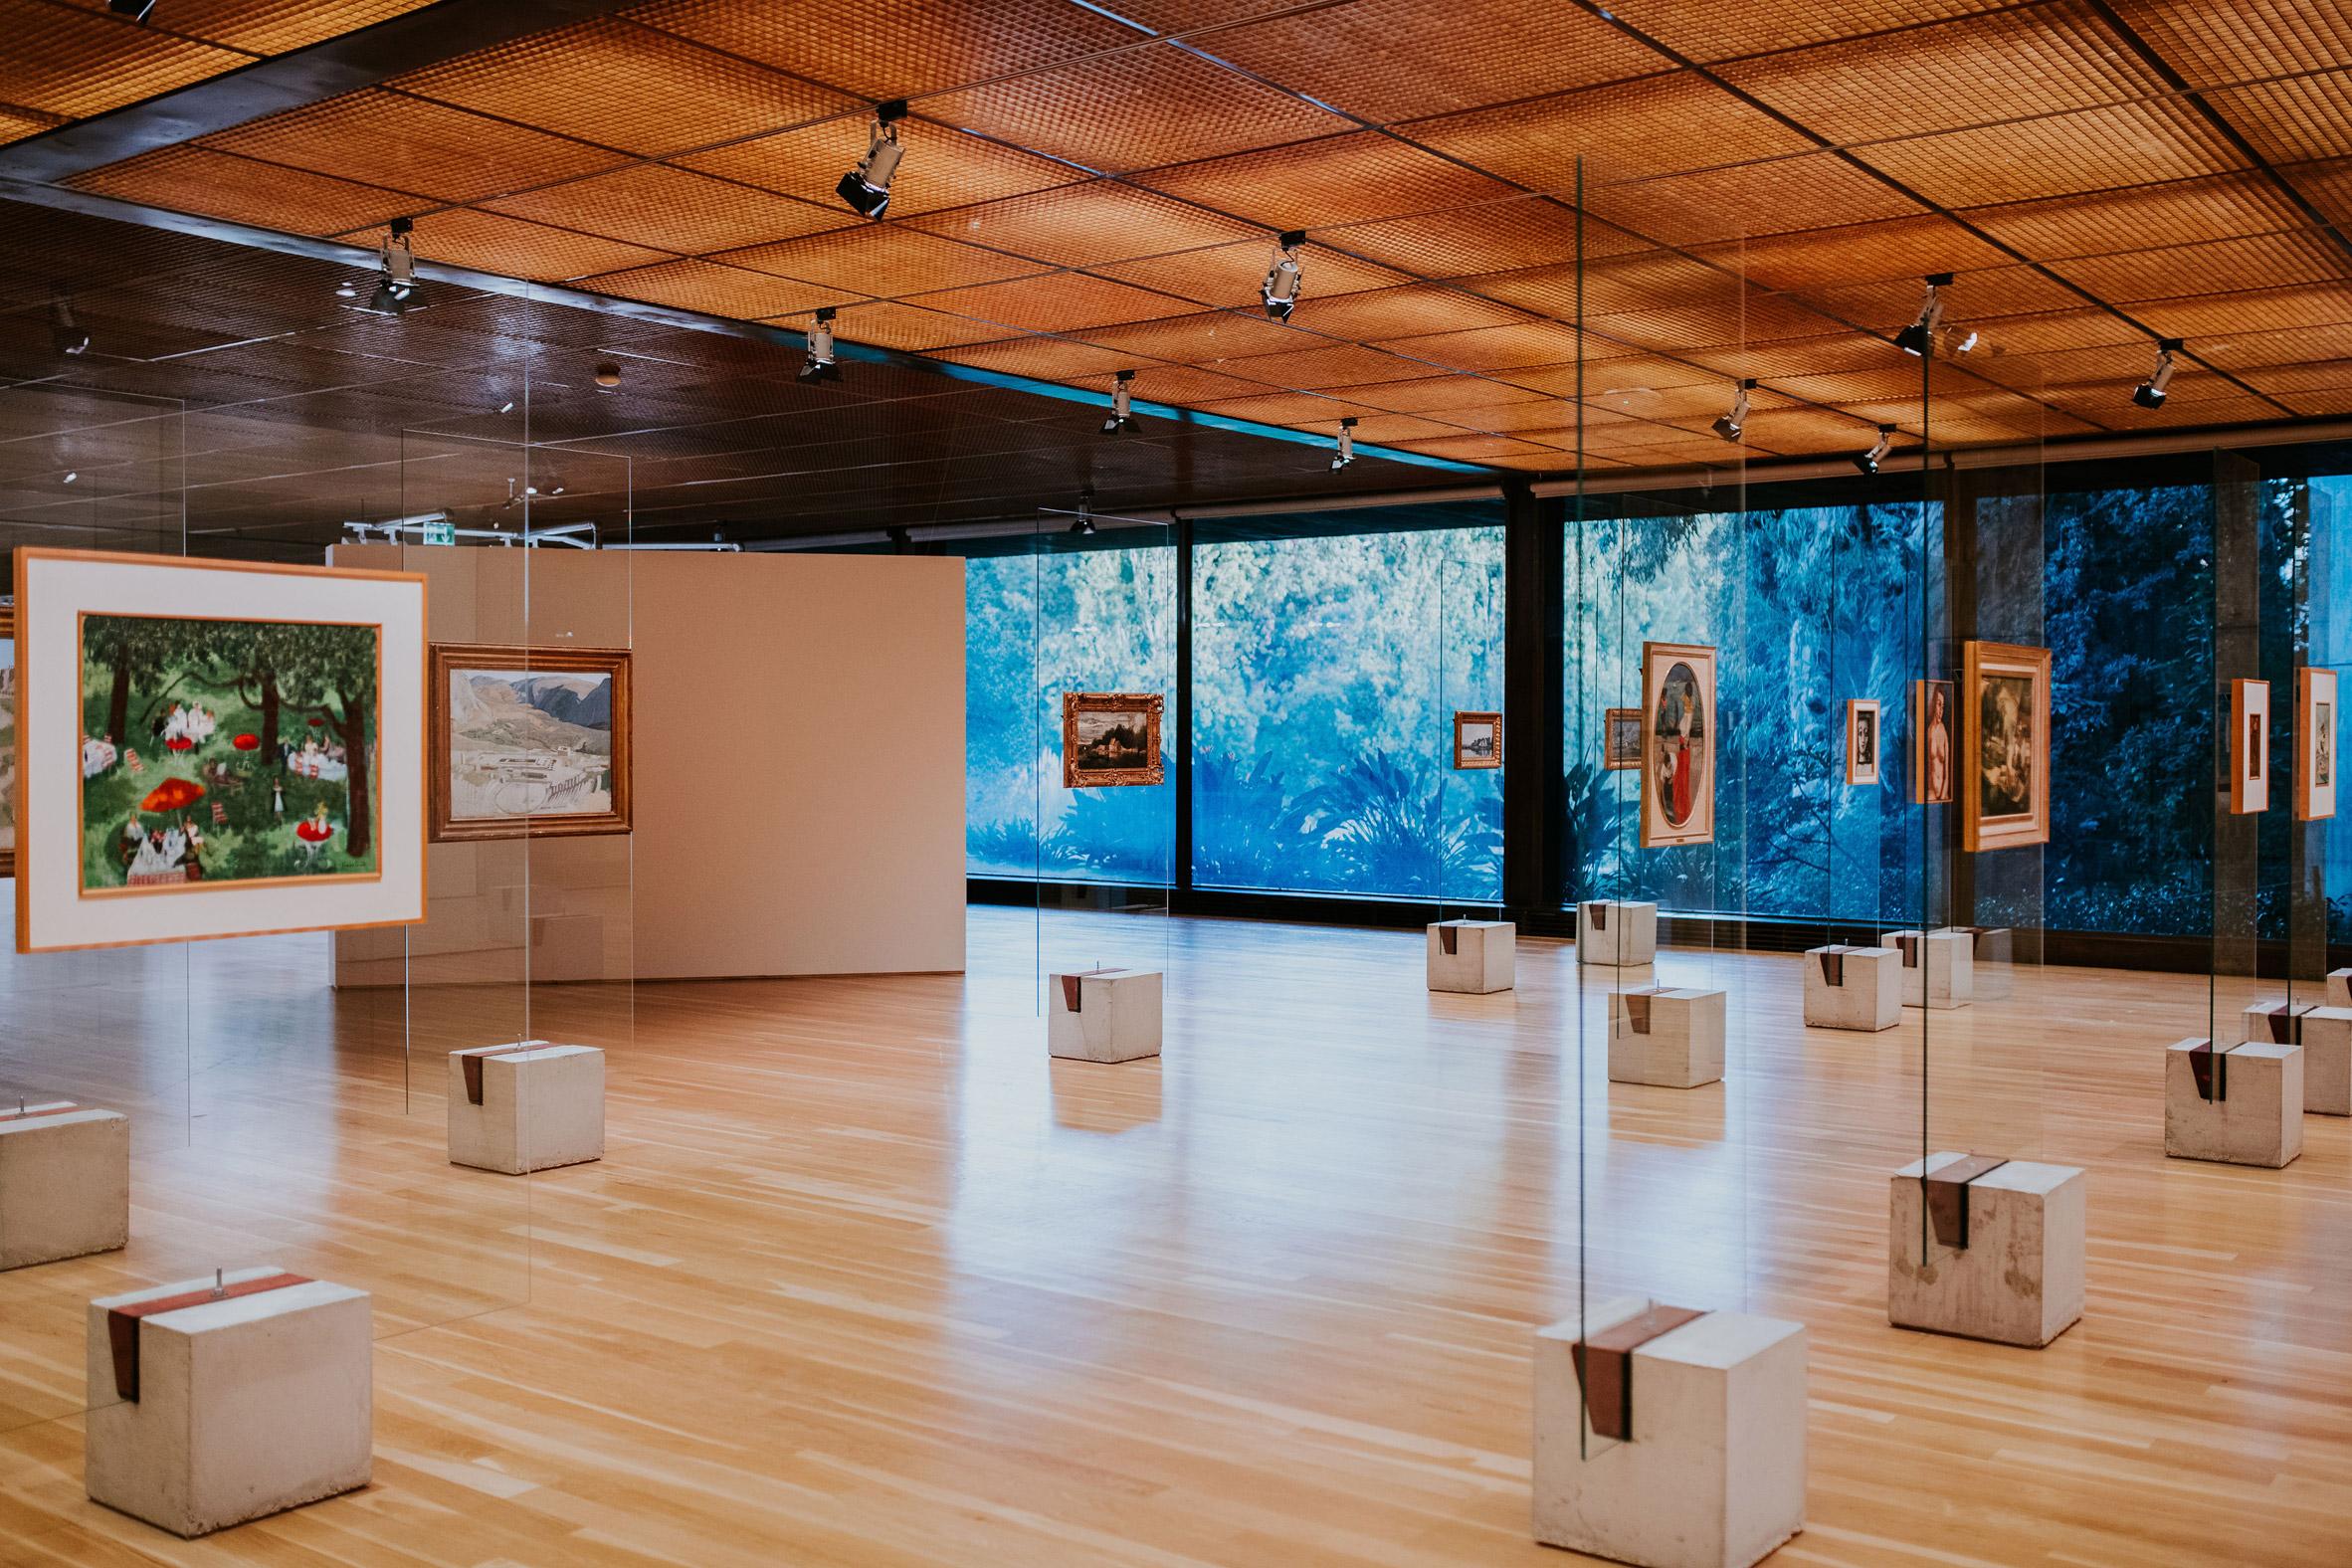 Lina Bo Bardi's exhibition design at Art on Display at the Gulbenkian Museum